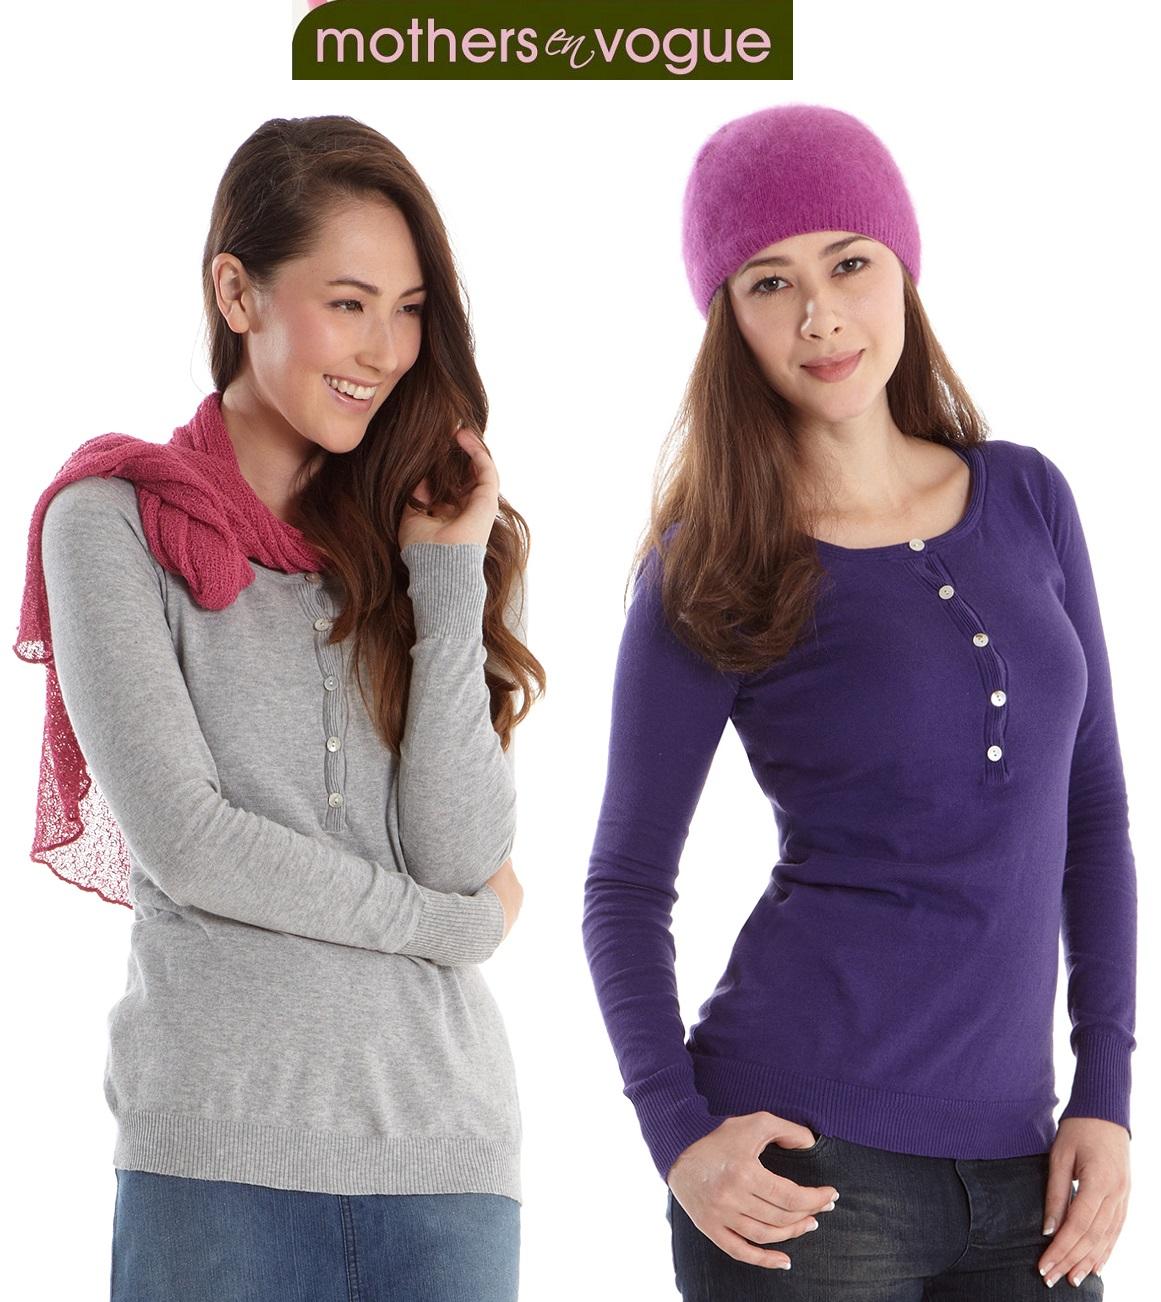 mothers-en-vogue-basic-button-down-nursing-sweater-all.jpg